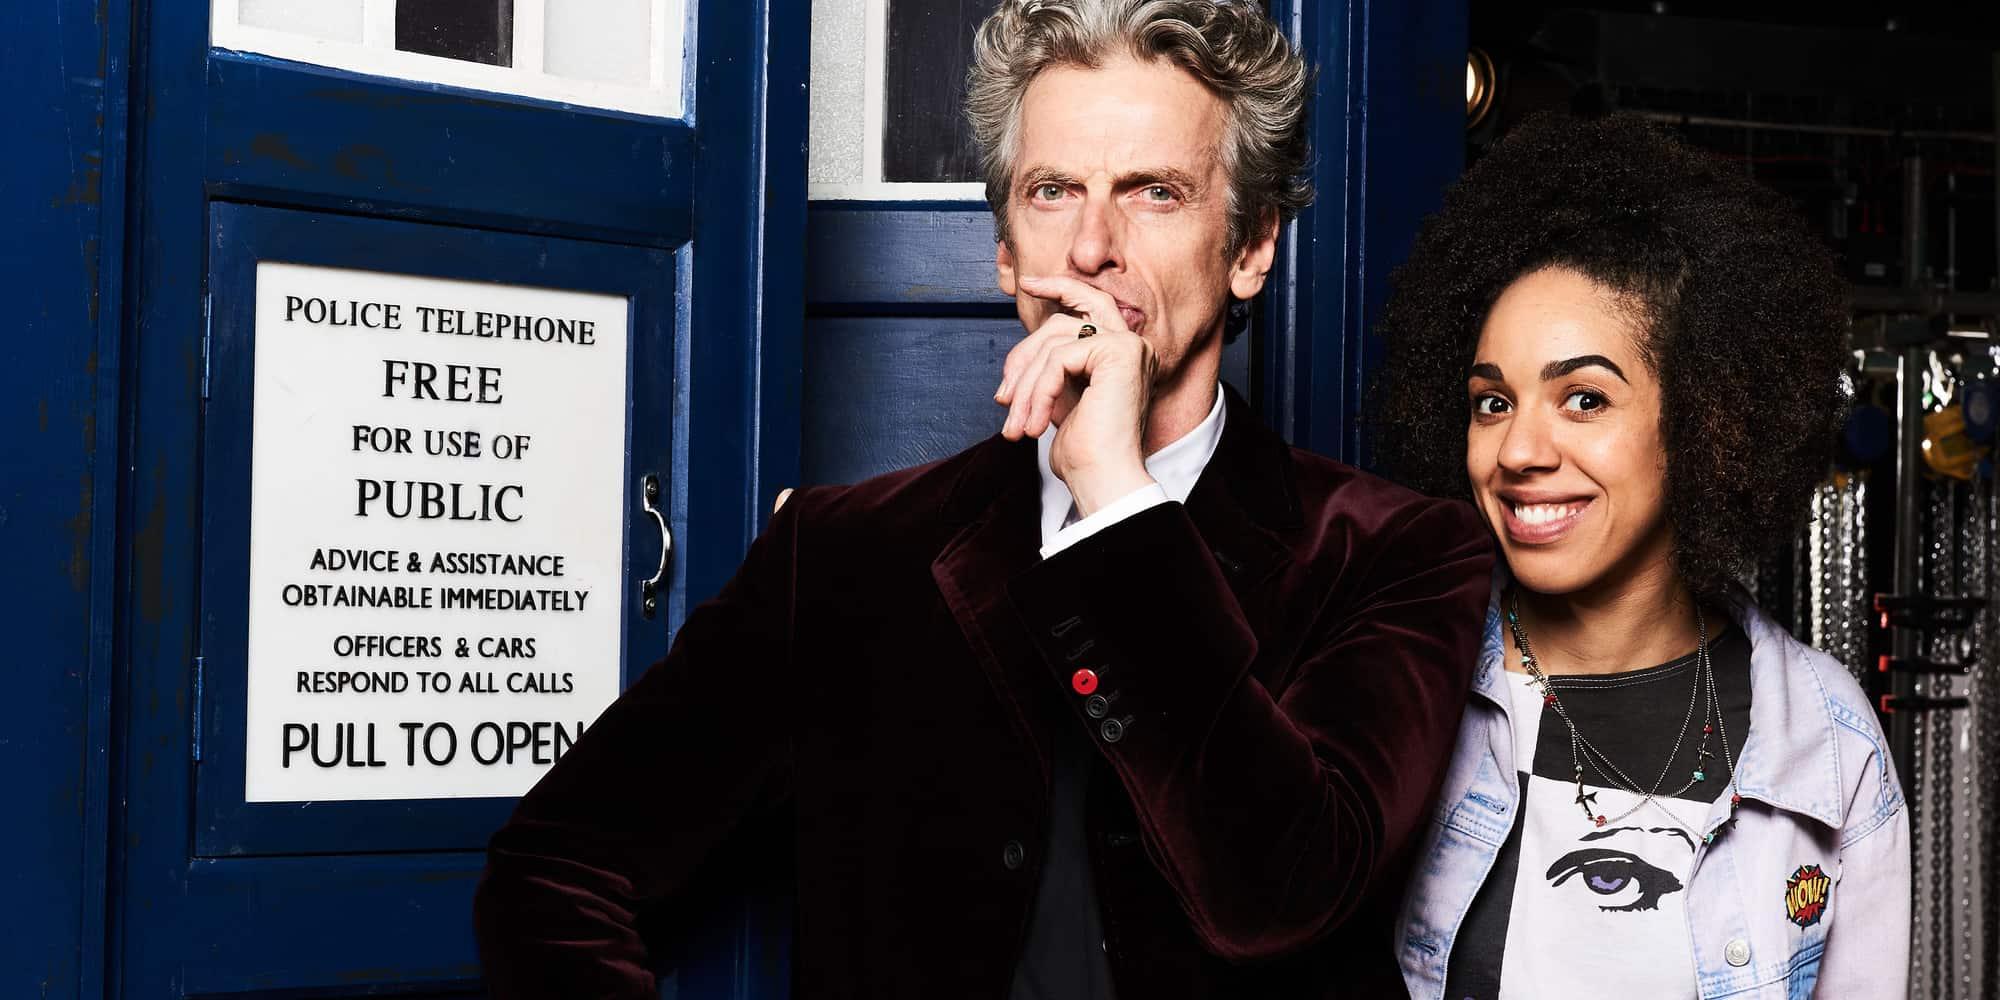 Doctor Who Peter Capaldi Bill Pearl Mackie, Hay una lesbiana en mi sopa